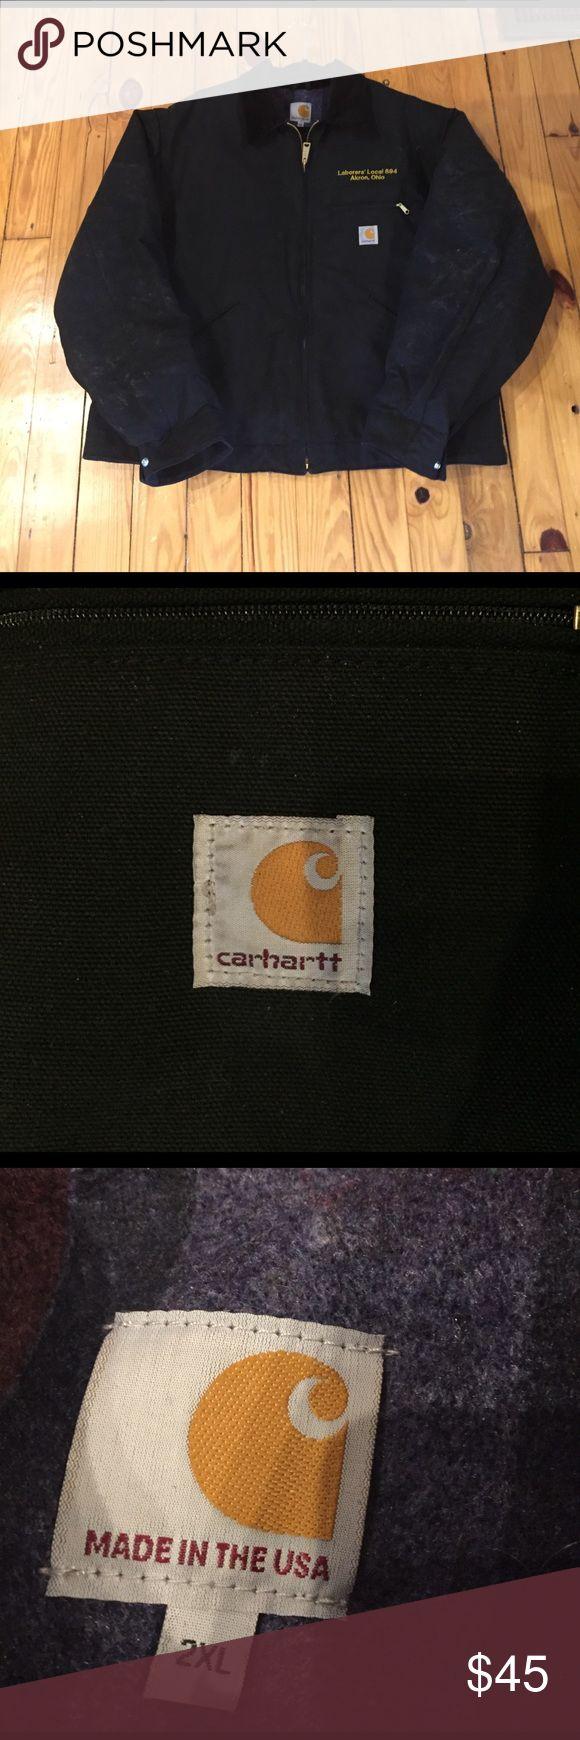 Men's 2XL Carhartt  Worn once! Super nice 2XL carhart! Made in US! Carhartt Jackets & Coats Military & Field